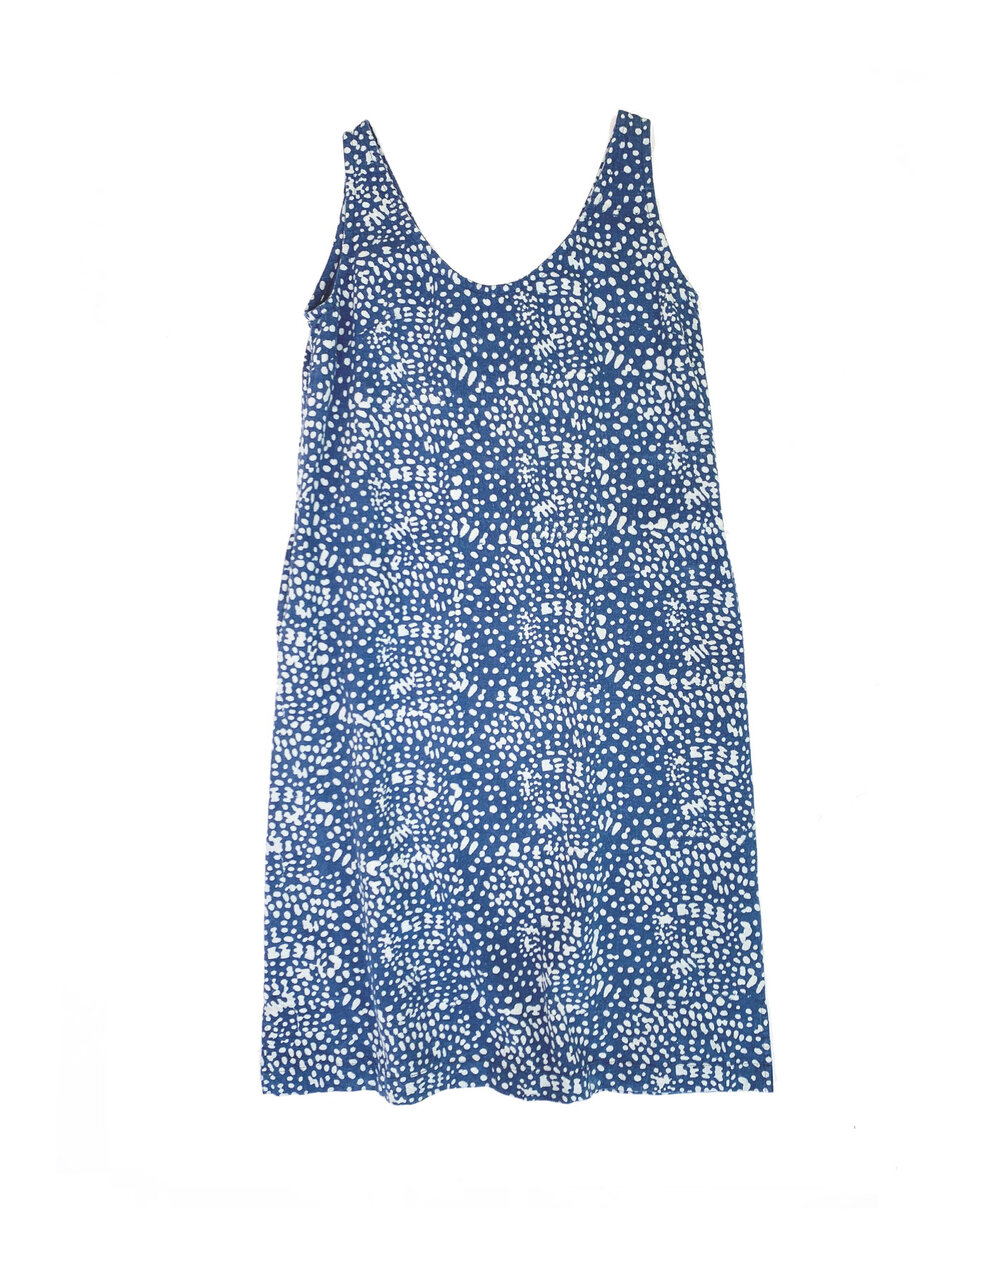 PO-EM_Maxi_Dress_IndigoSplash.jpg